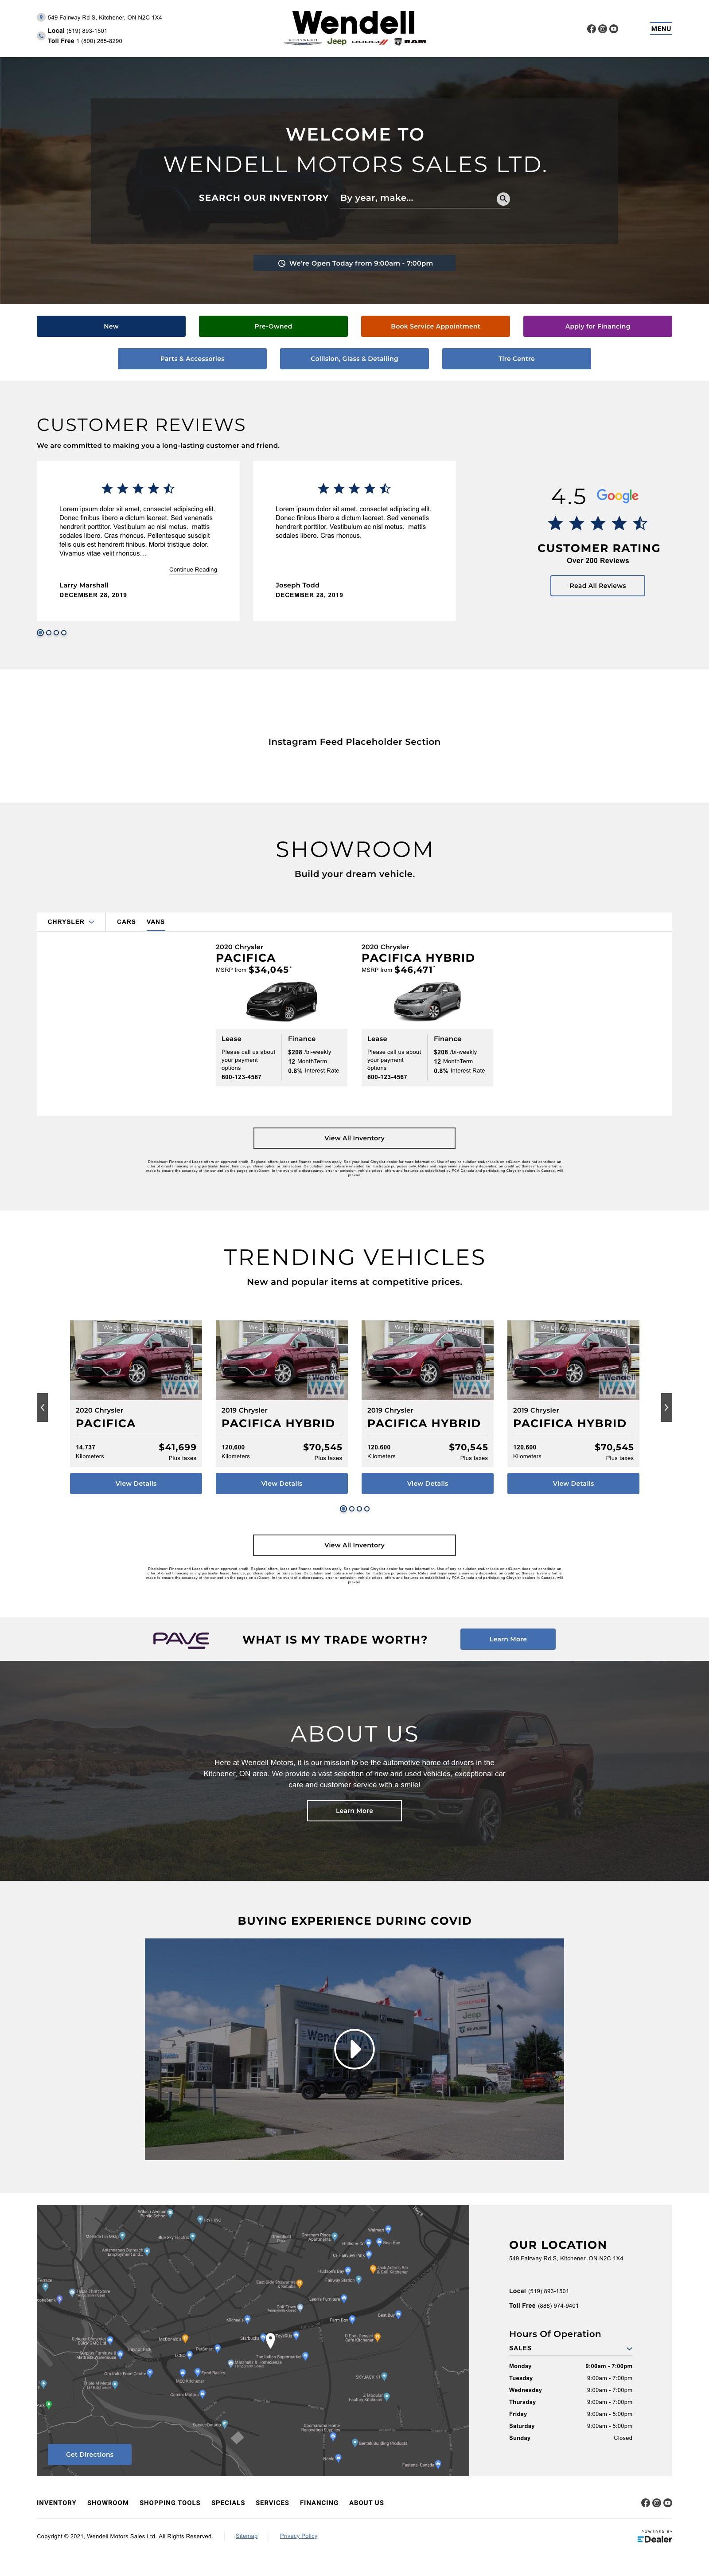 Wendell Motor Sales Ltd